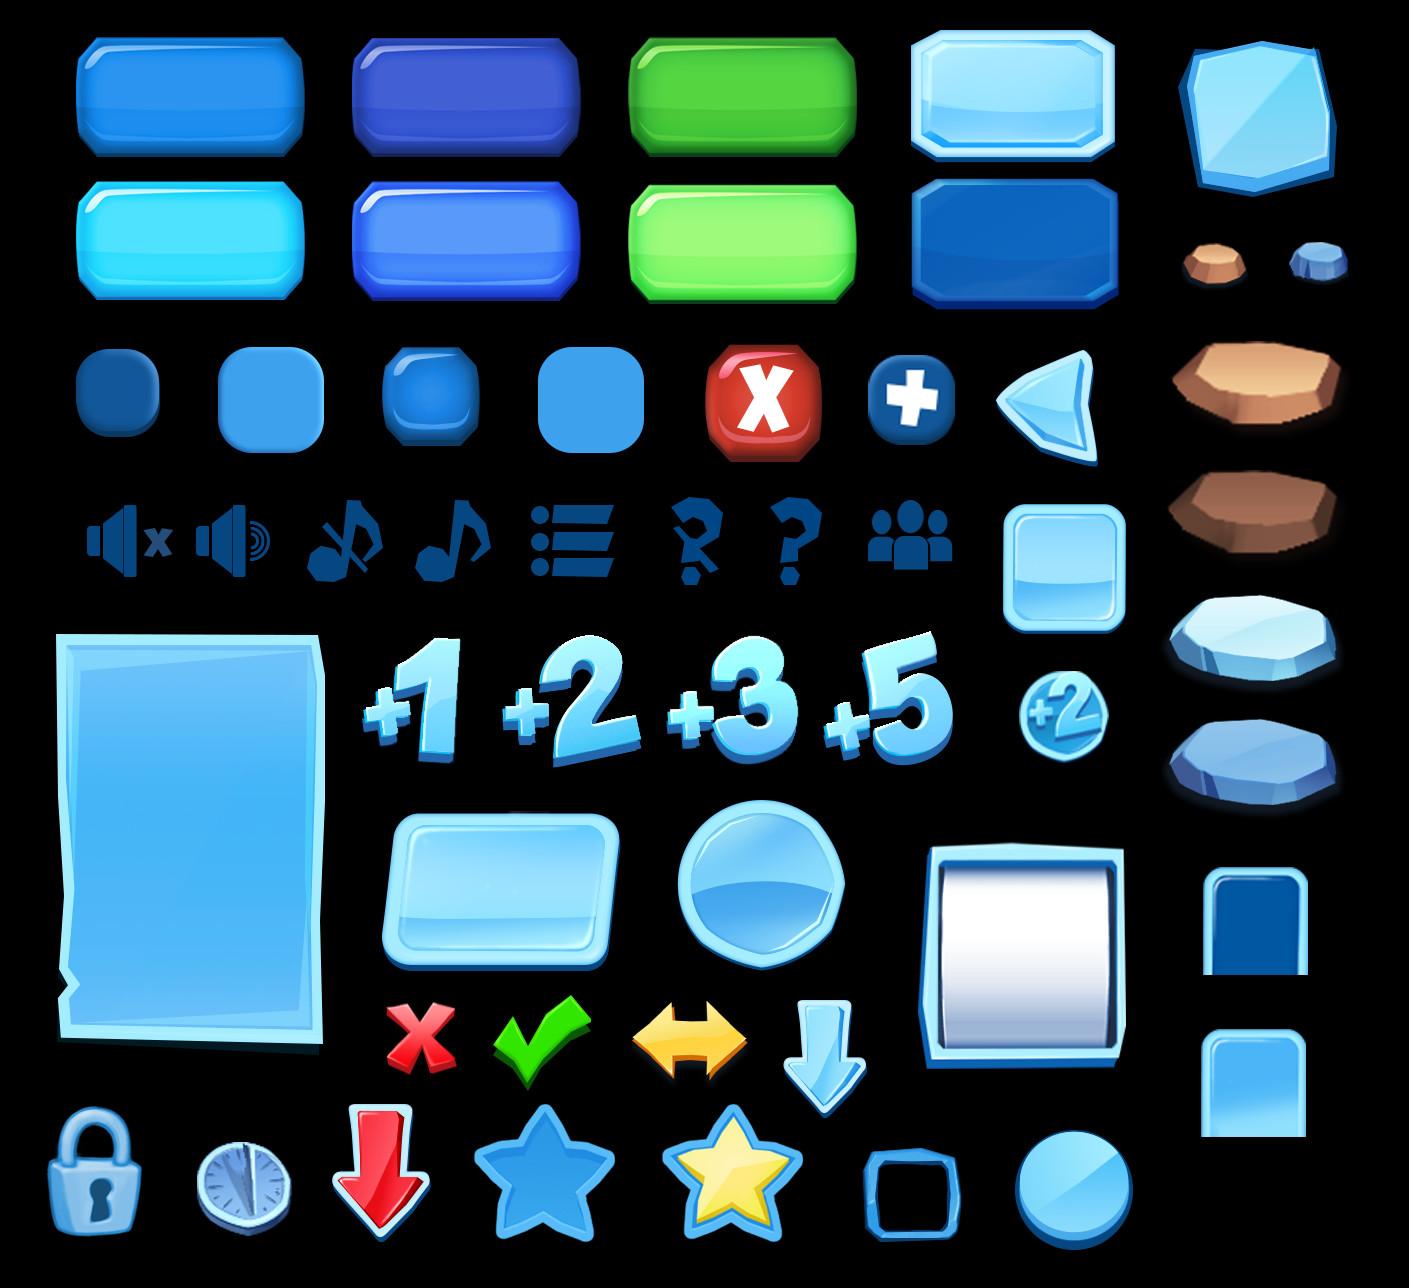 Menu icons for IA:AB